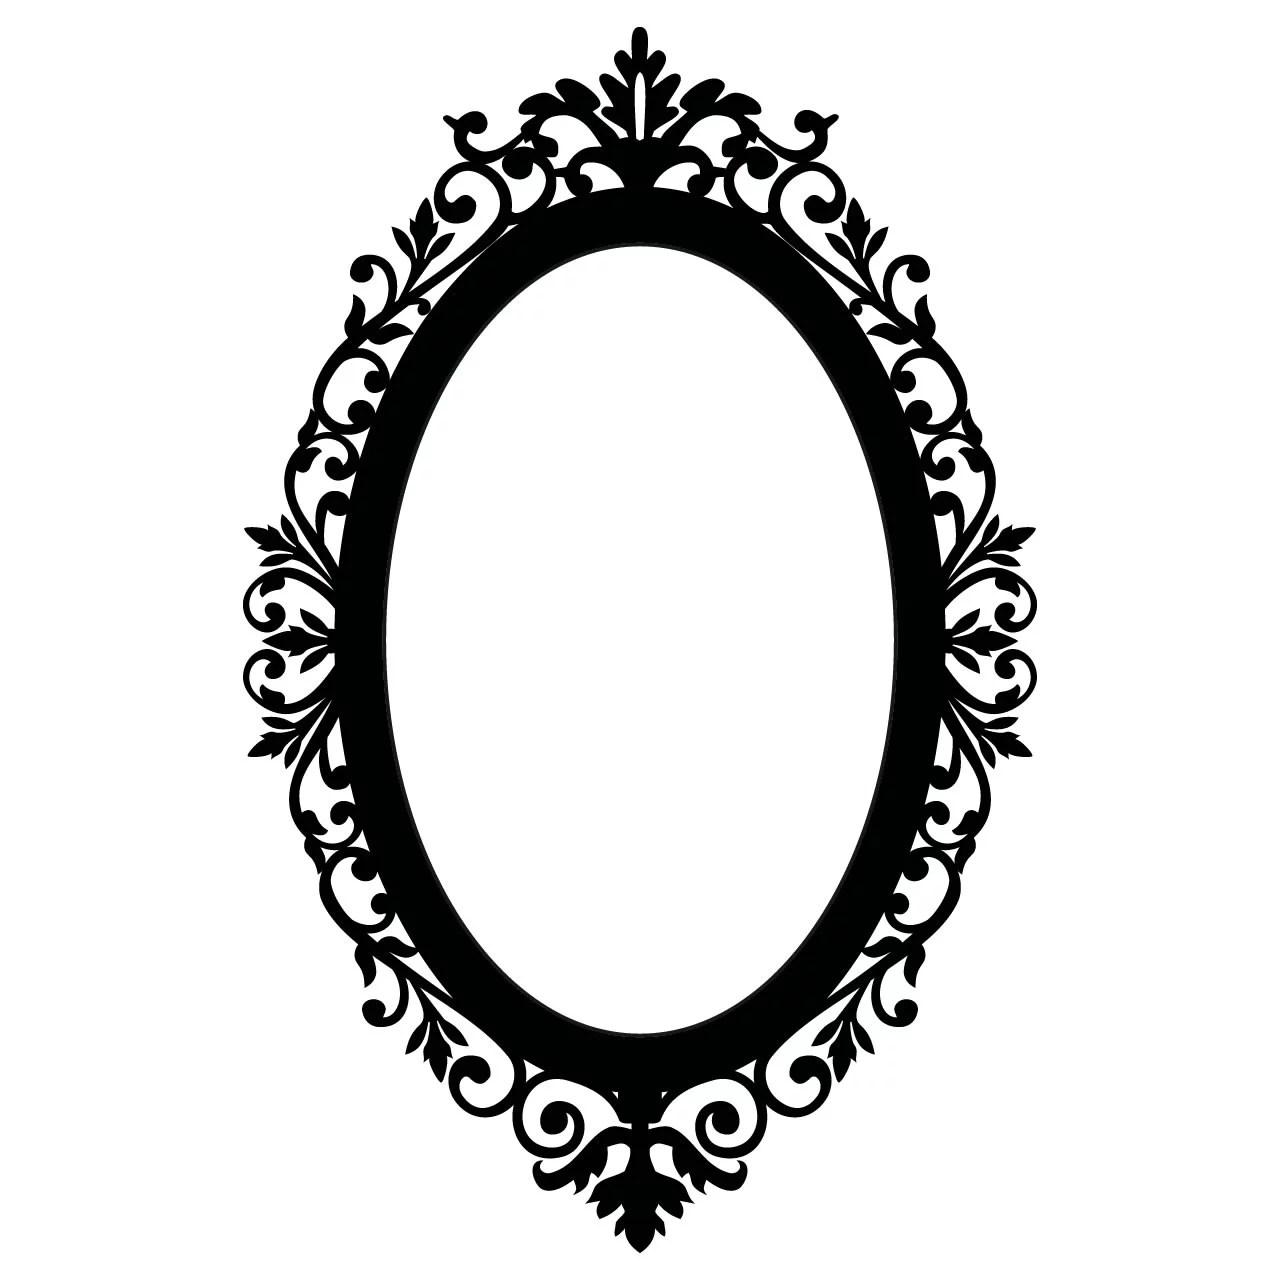 Ornate Oval Frame Vintage Wall Sticker